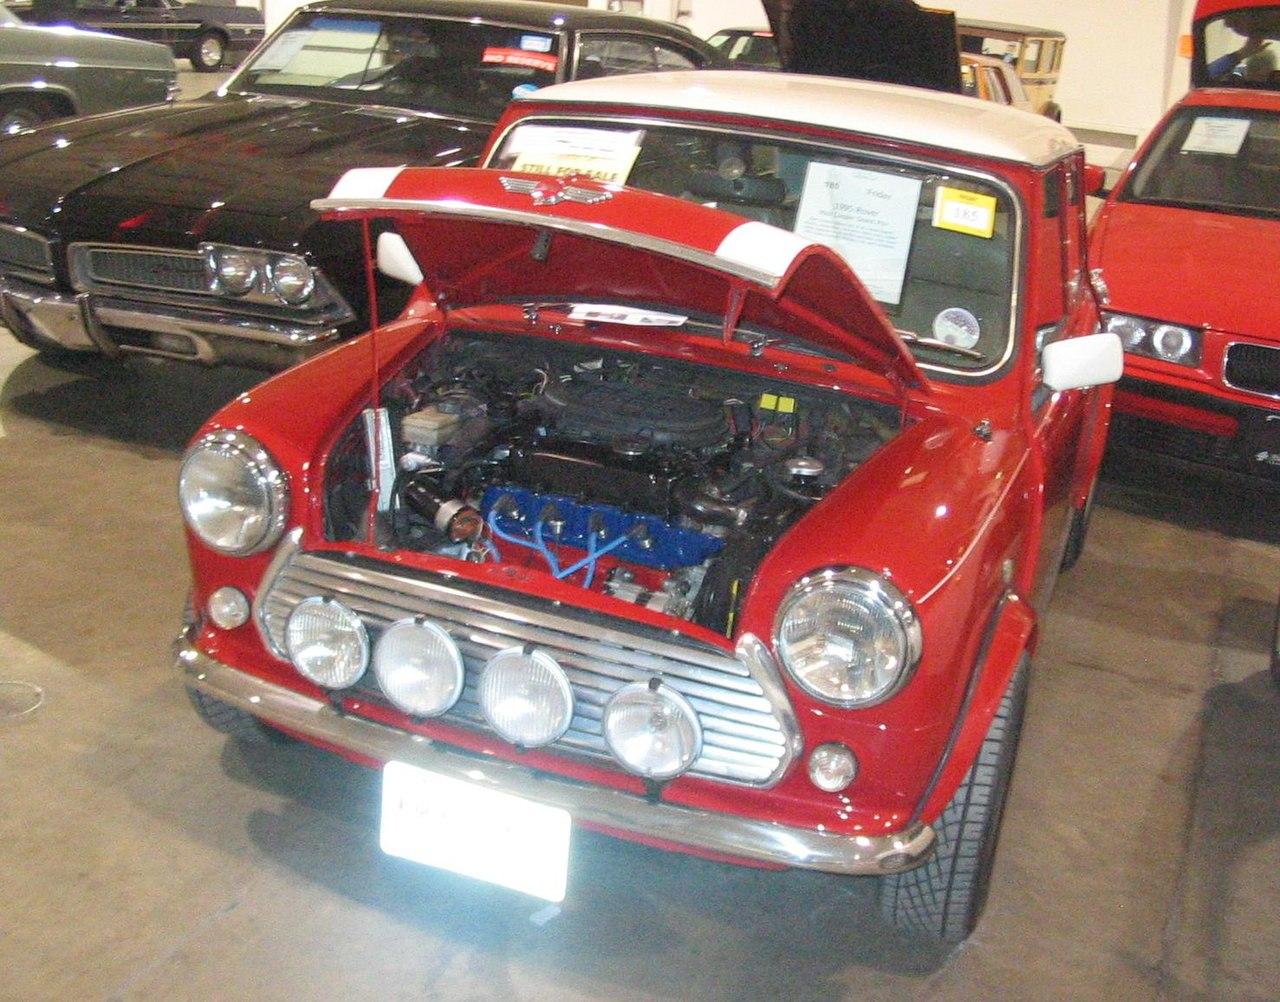 file 39 95 rover mini cooper grand prix toronto spring 39 12 classic car auction jpg wikimedia. Black Bedroom Furniture Sets. Home Design Ideas